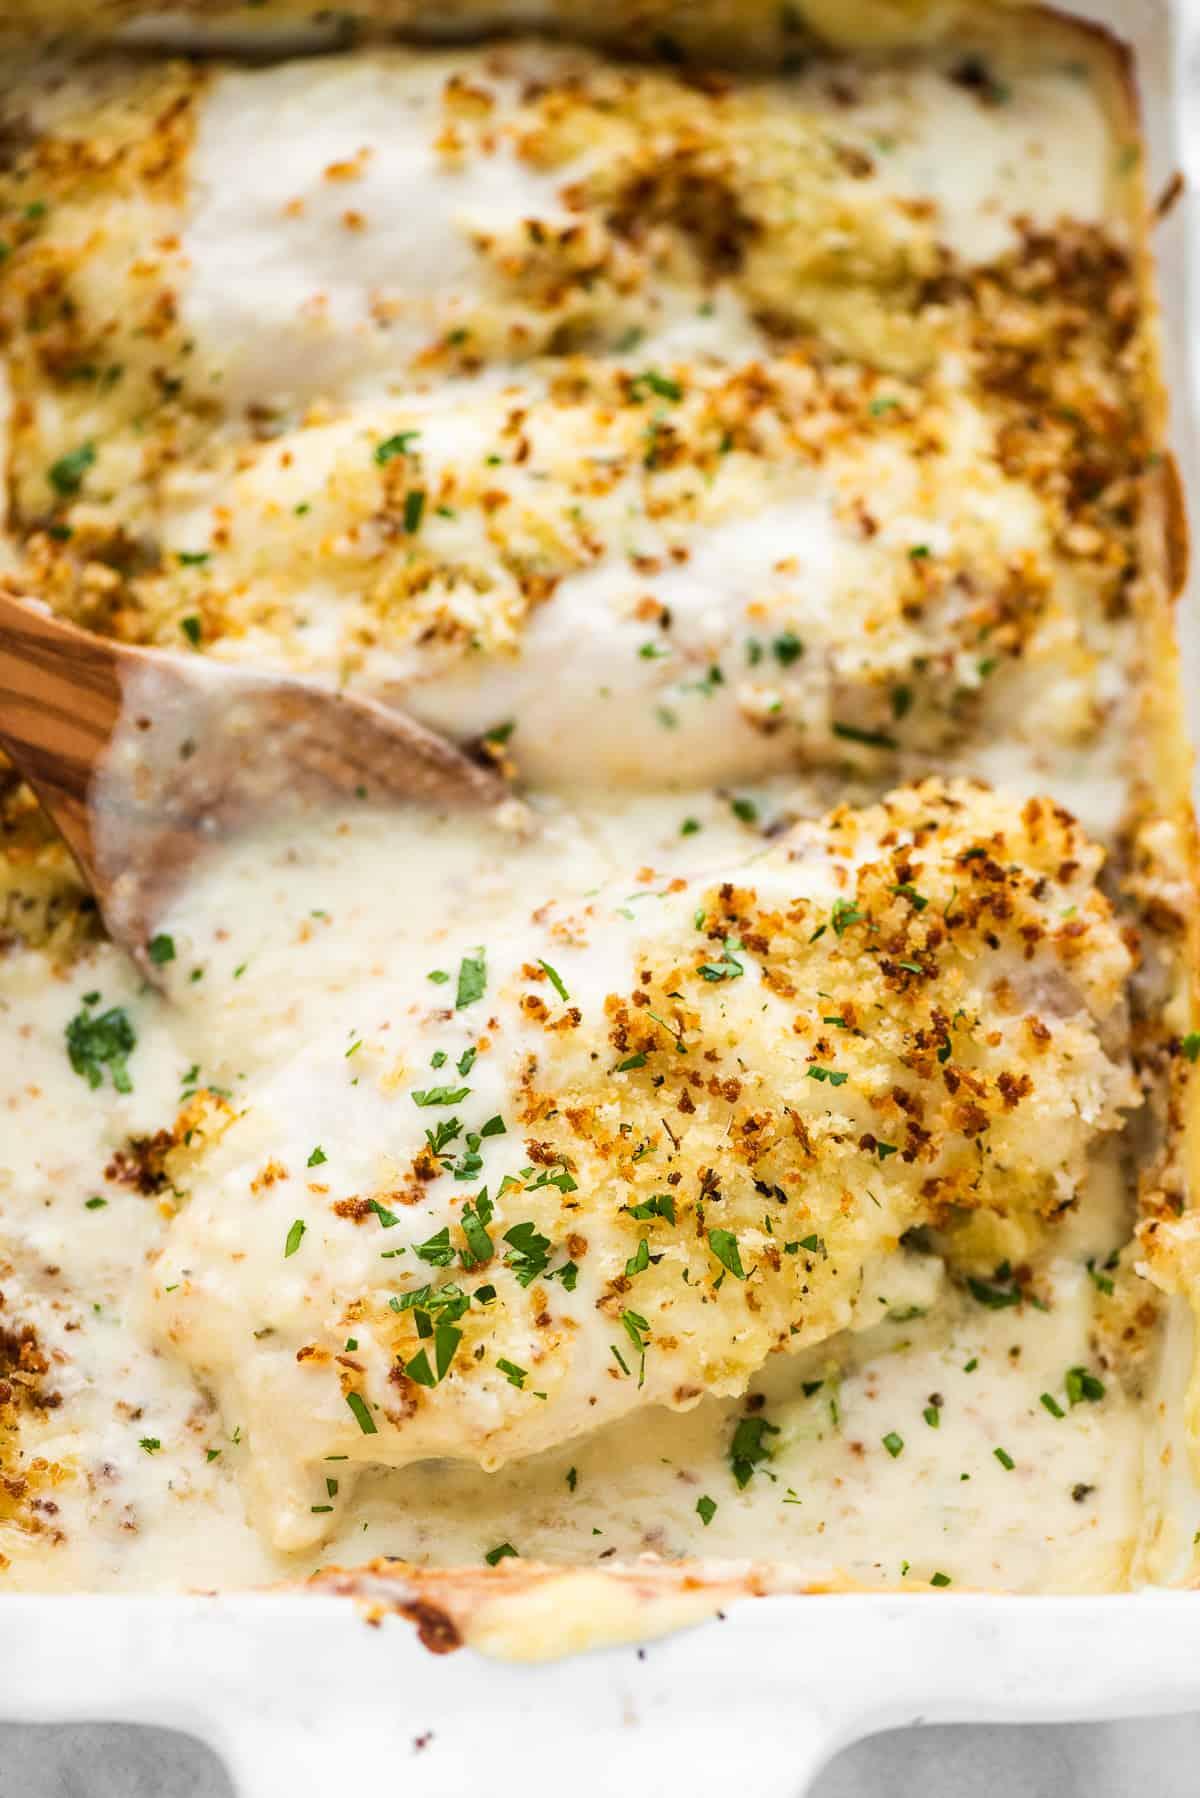 Swiss chicken baked in a casserole dish.